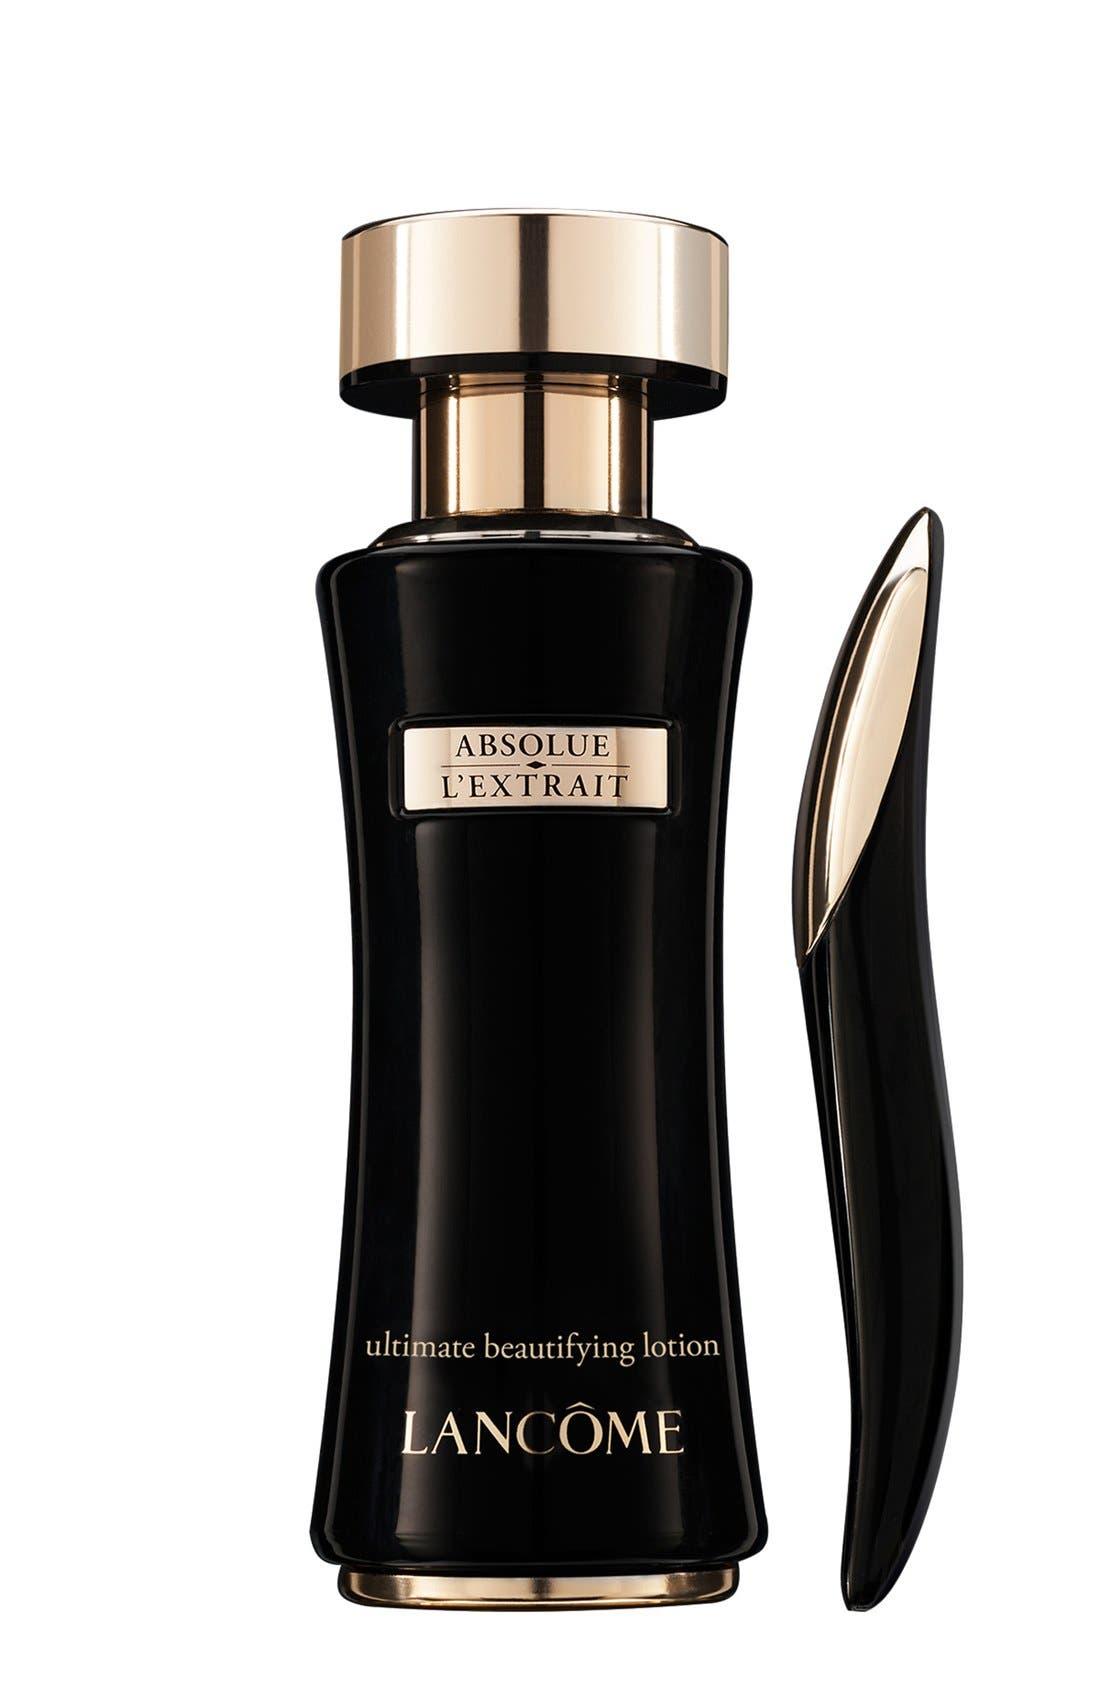 Lancome Absolue Lextrait Regenerating & Renewing Ultimate Elixir-Concentrate